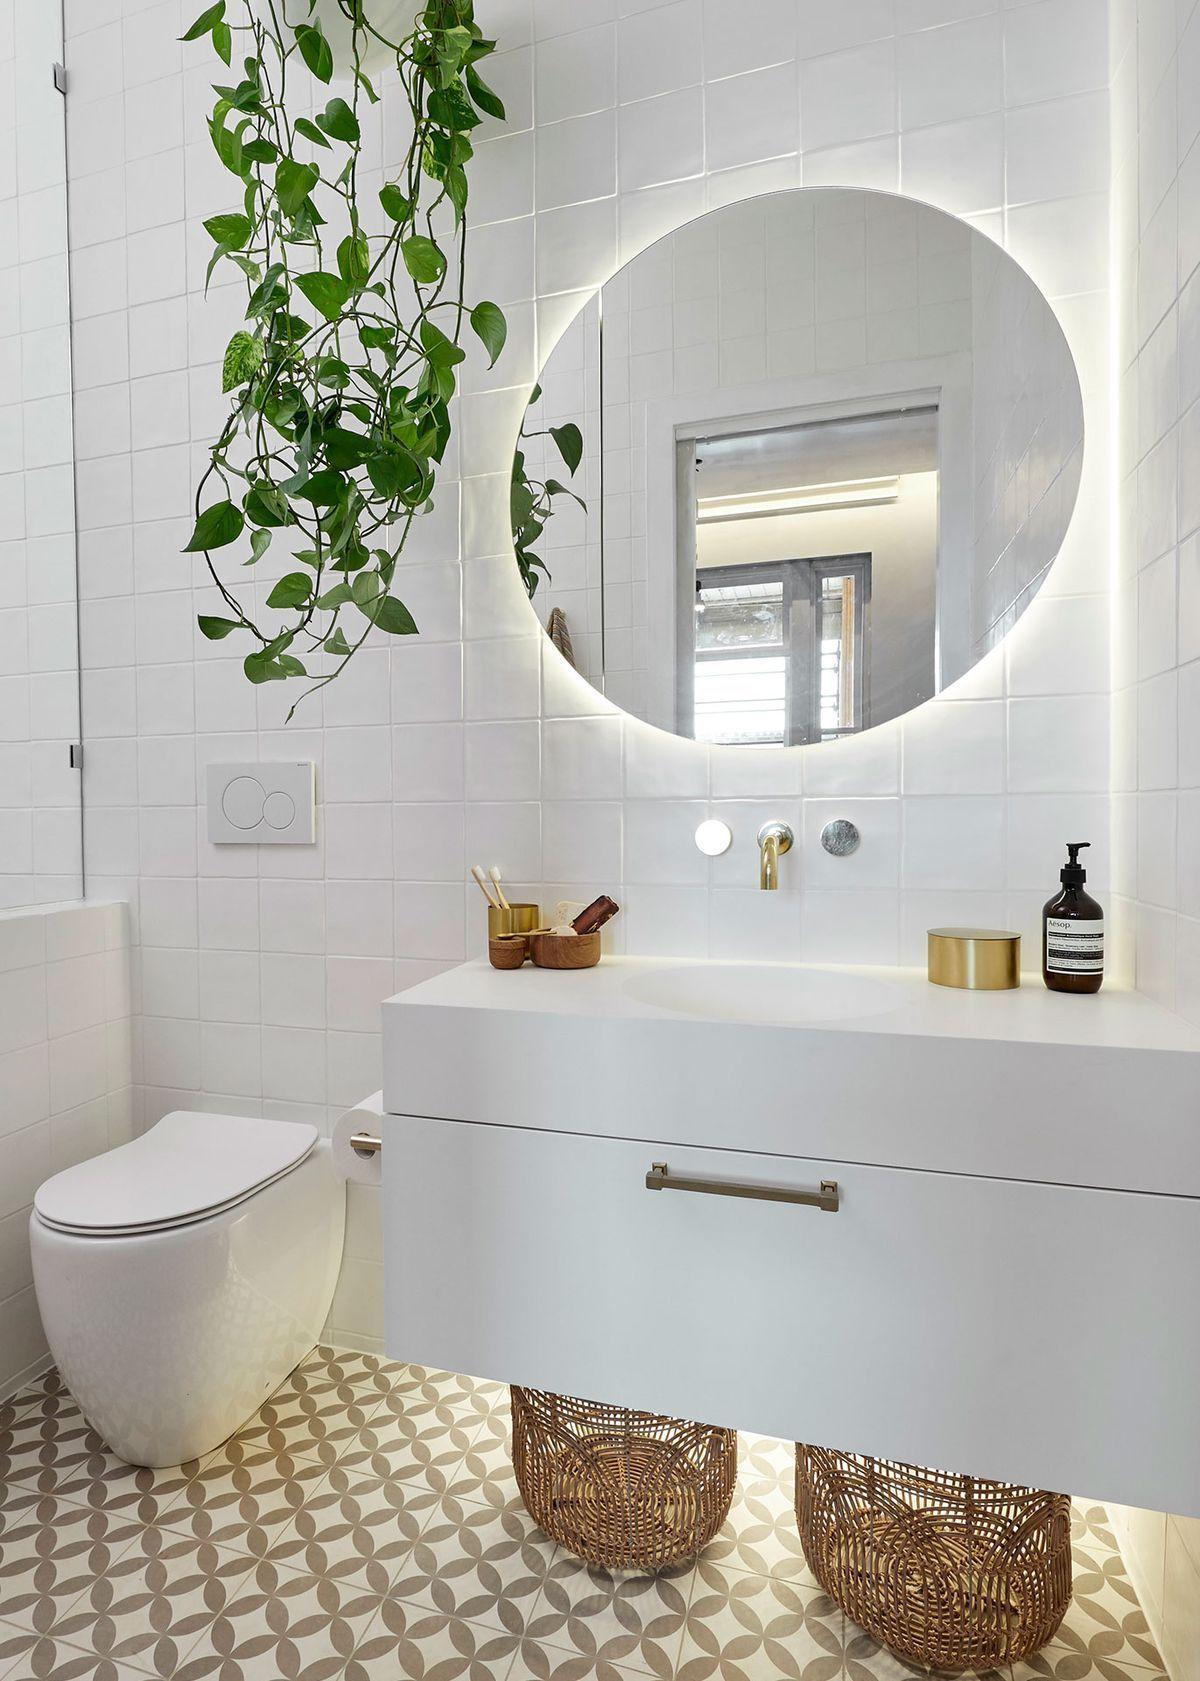 Pin On Renovation Ideas Home decor dream decorate small bathroom